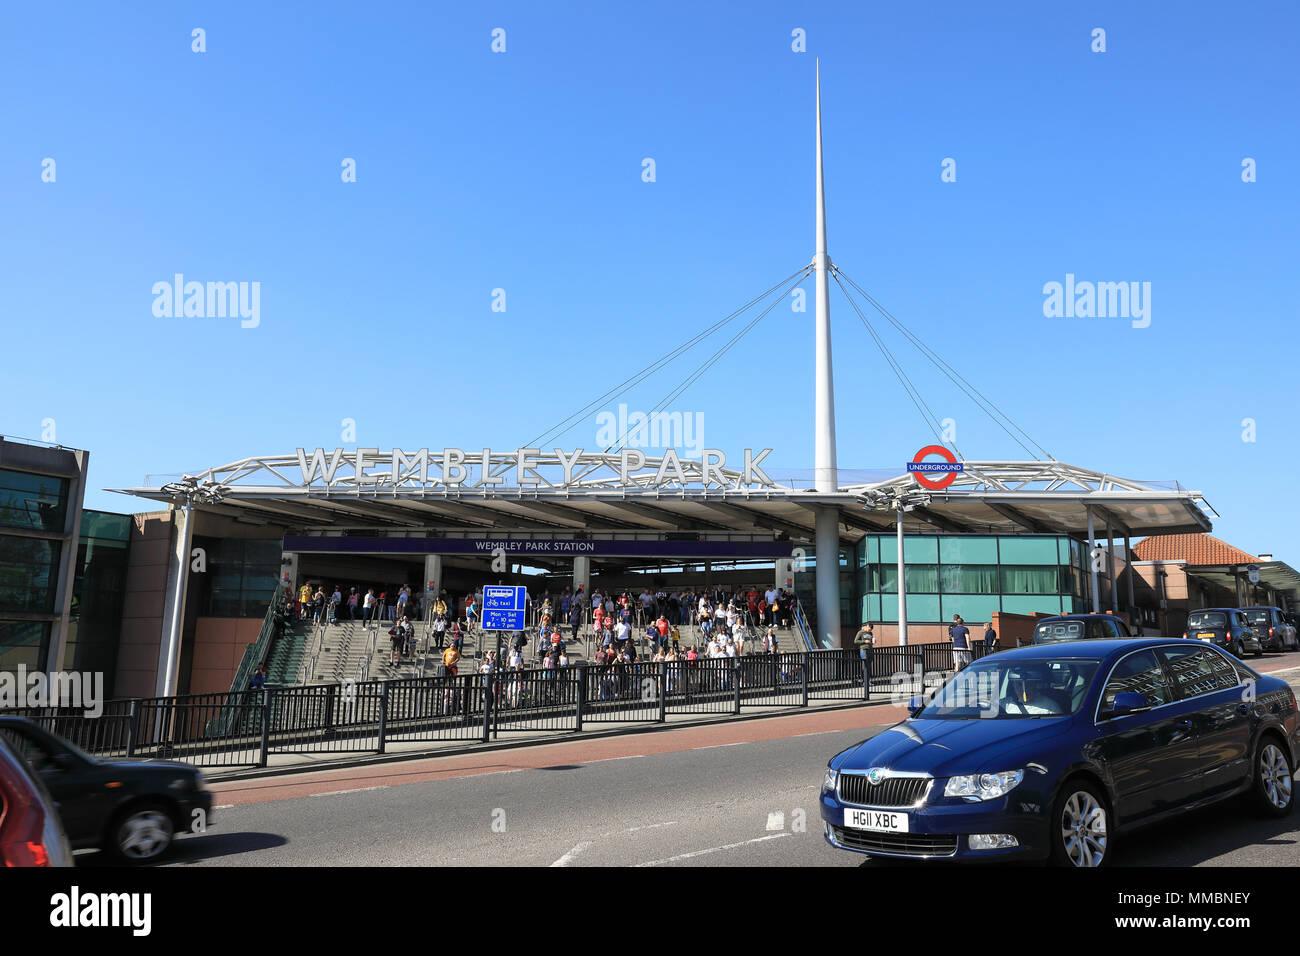 Wembley Park tube station for visiting Wembley Stadium, in NW London, UK - Stock Image